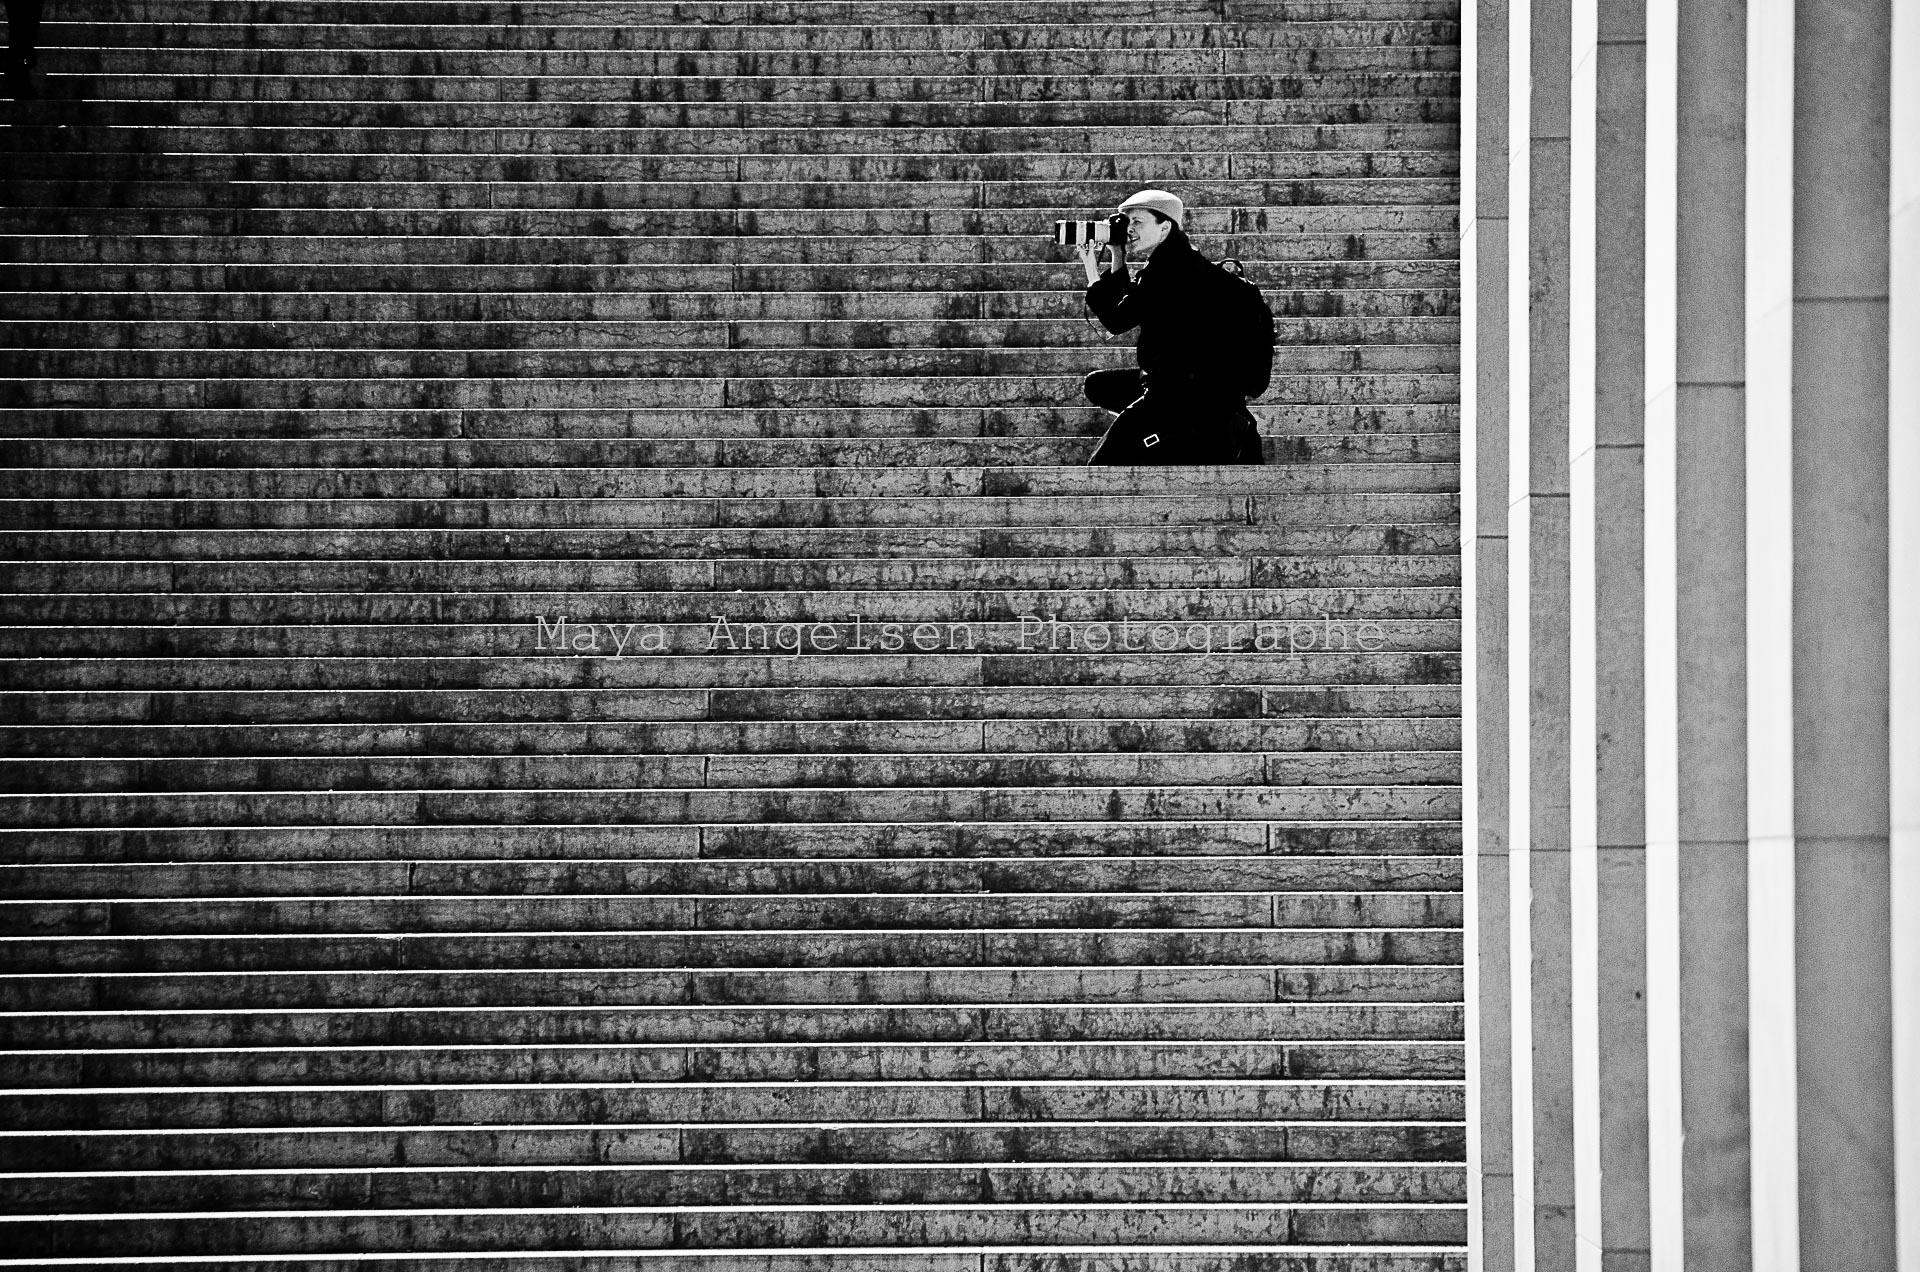 Photographe-streetphoto-Lignes-de-mire-Maya-Angelsen